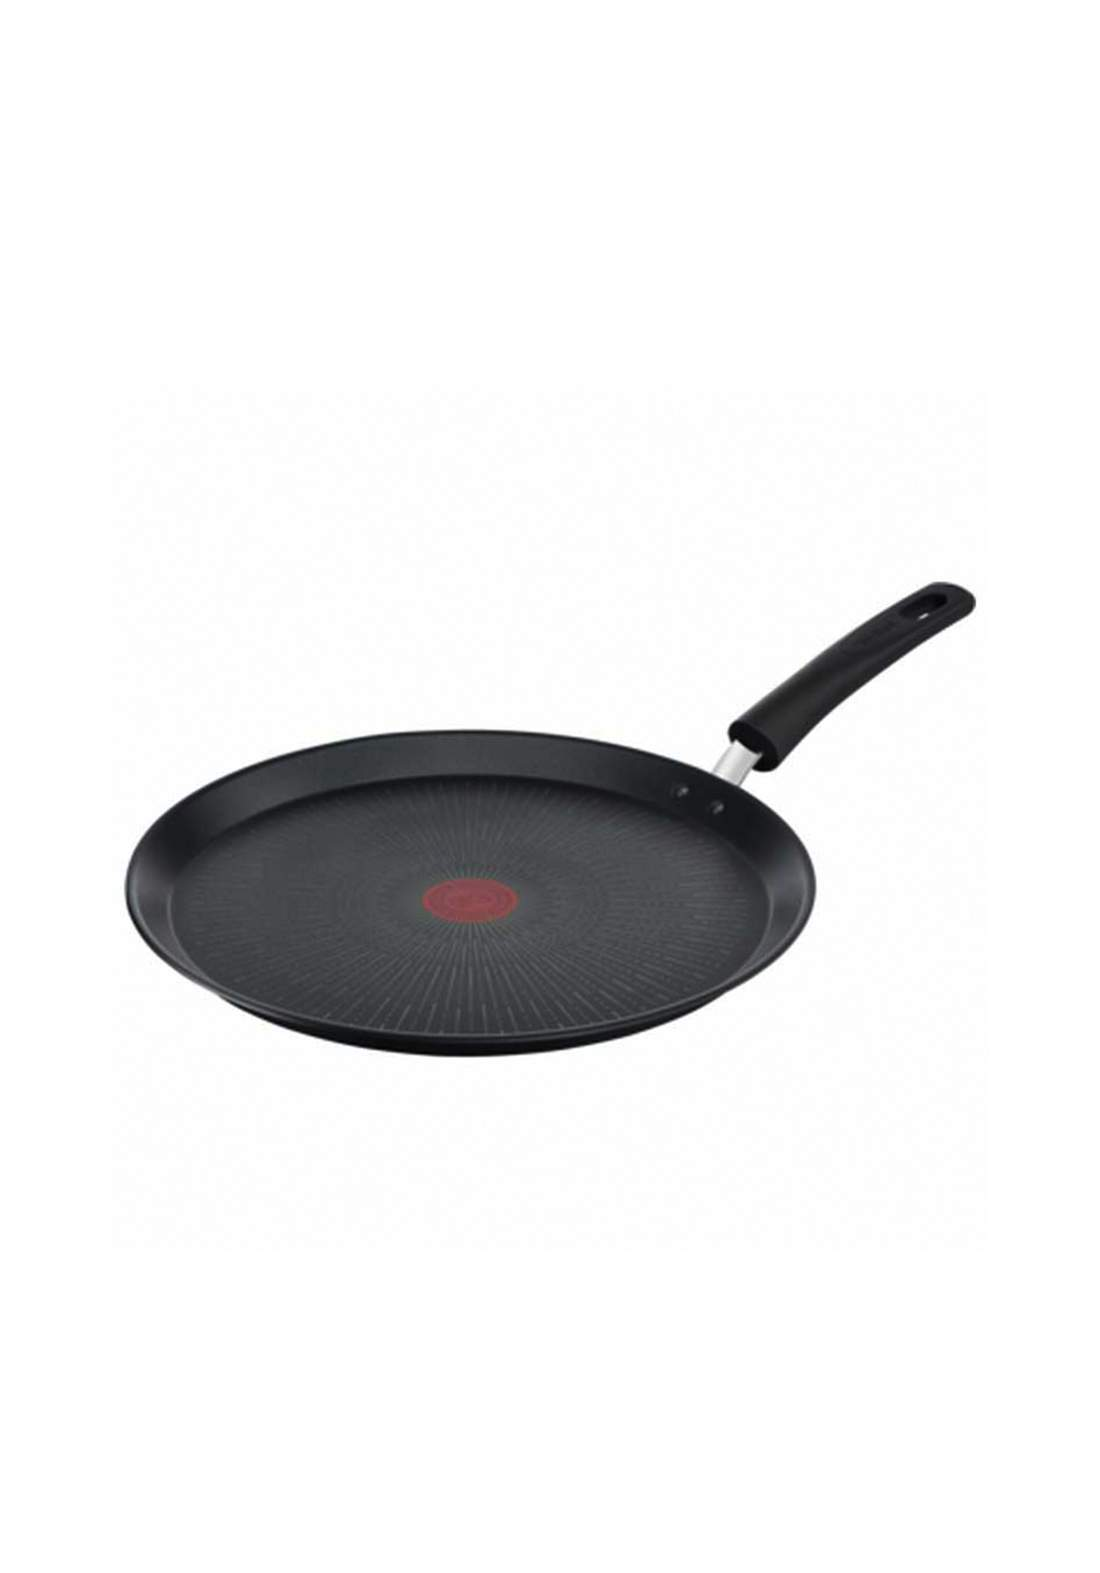 Tefal G2551602 P&P Alu Ns Induction Unlimited-Pancake 32cm  مقلاة